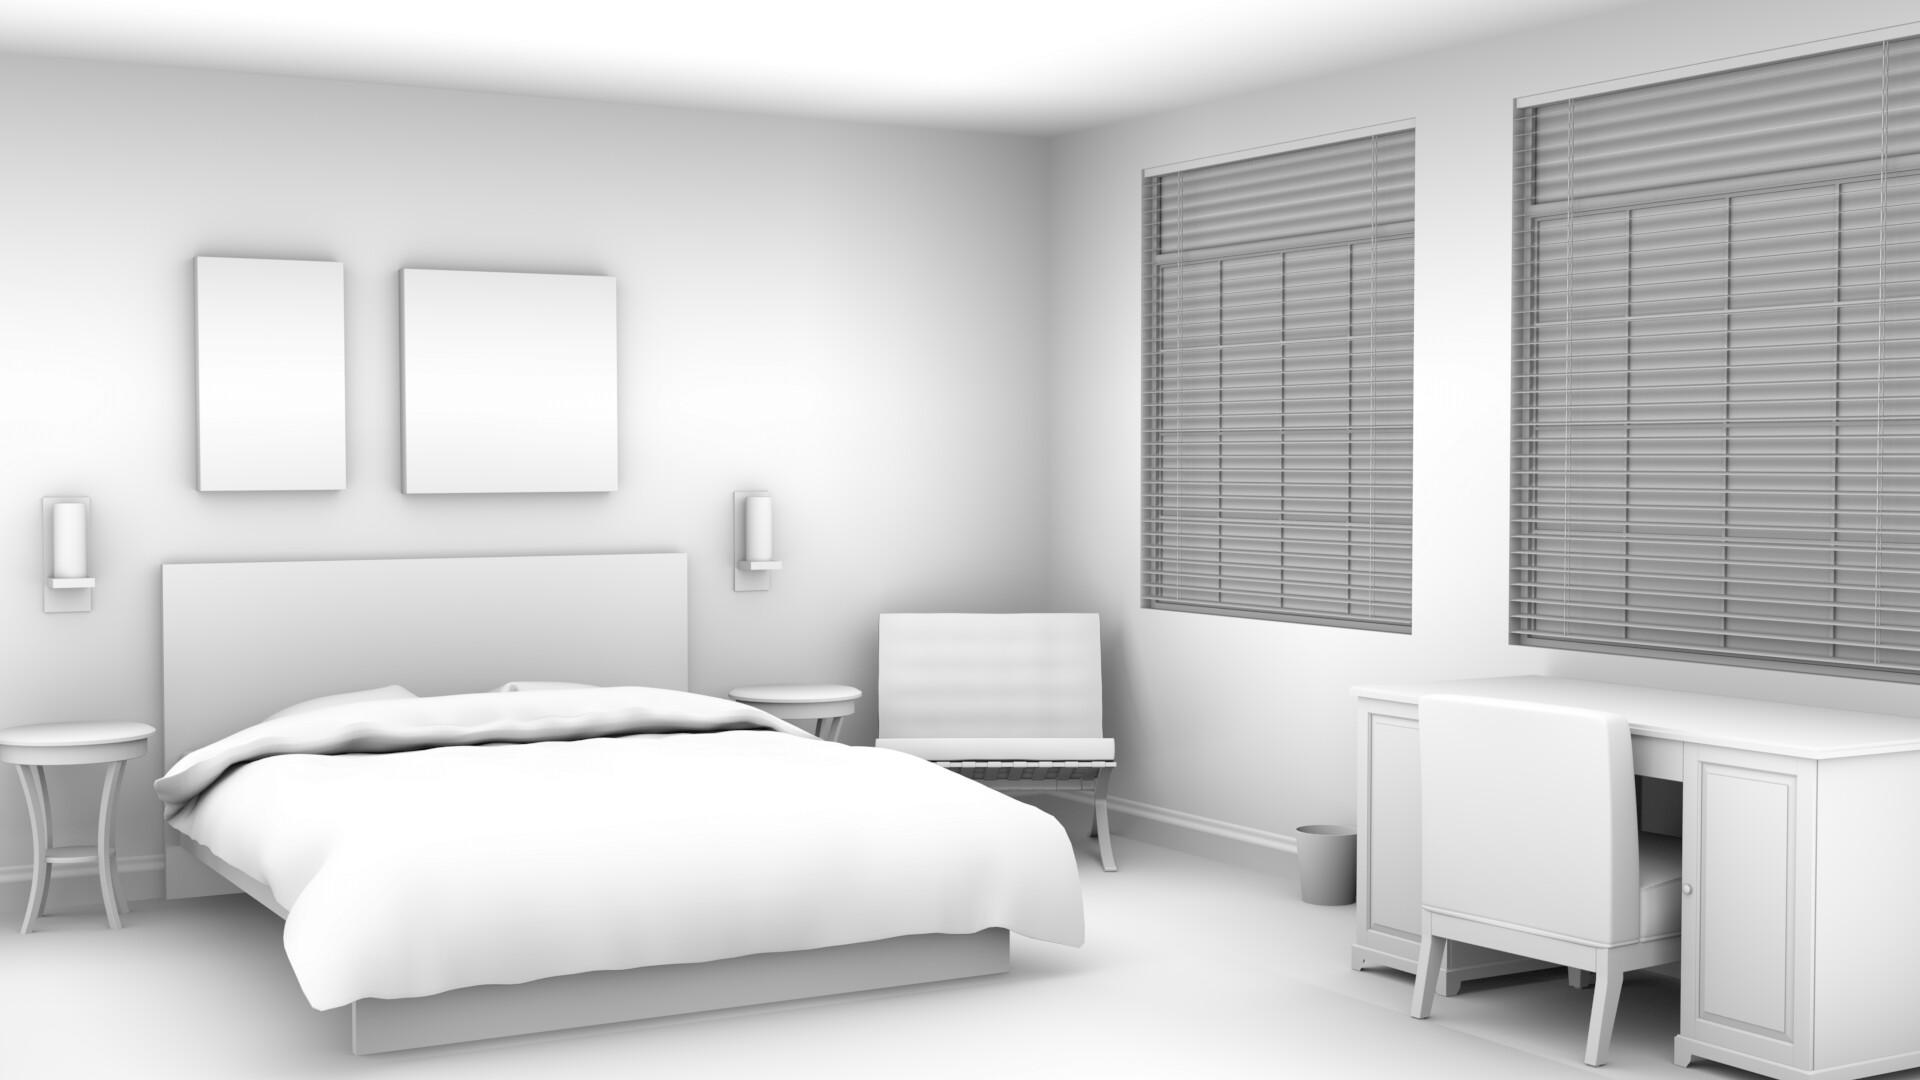 Jason colthrust hotelroom grey